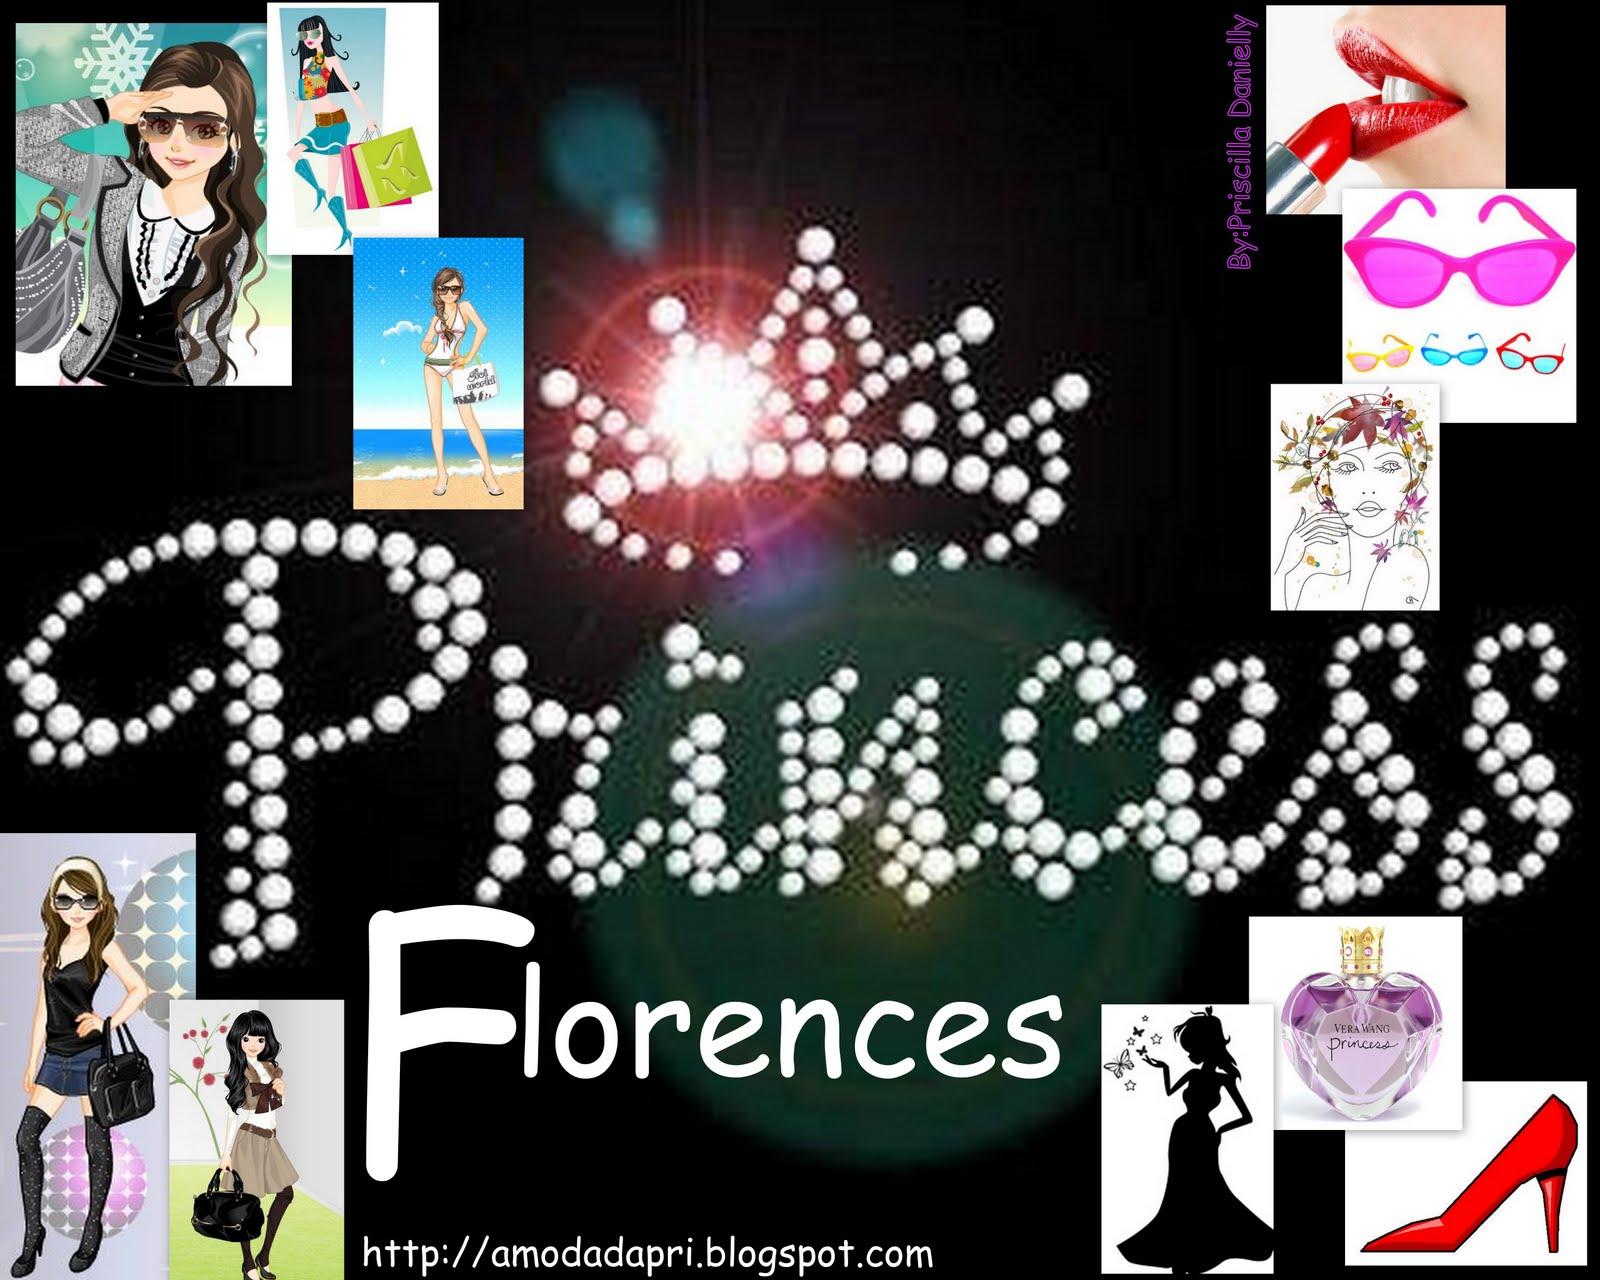 Princess Florences